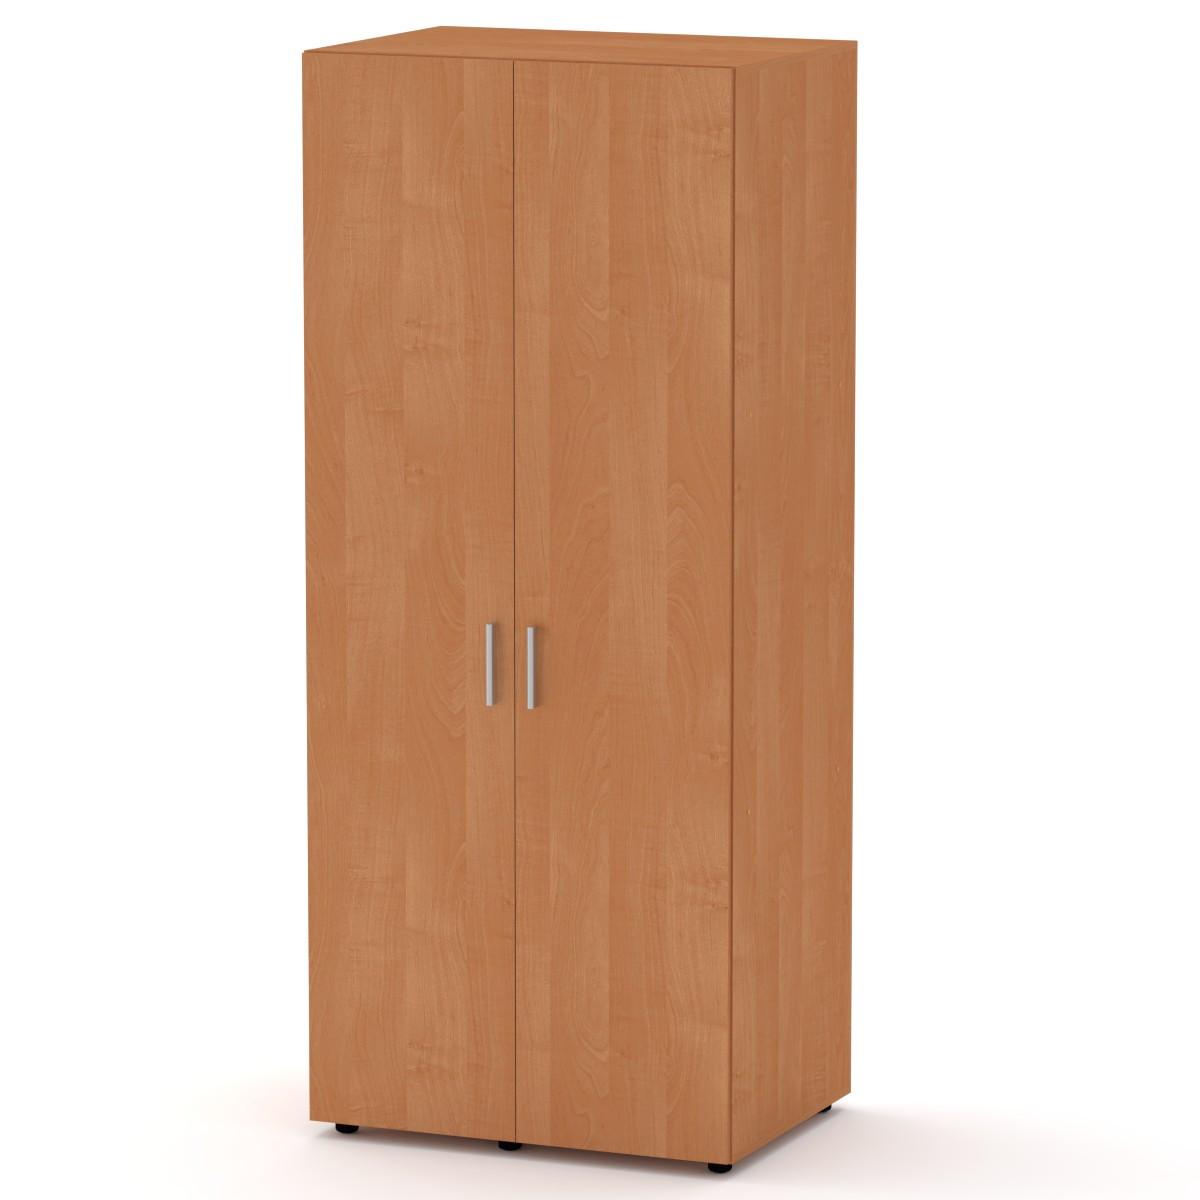 Шкаф-18 ольха Компанит (80х62х203 см)